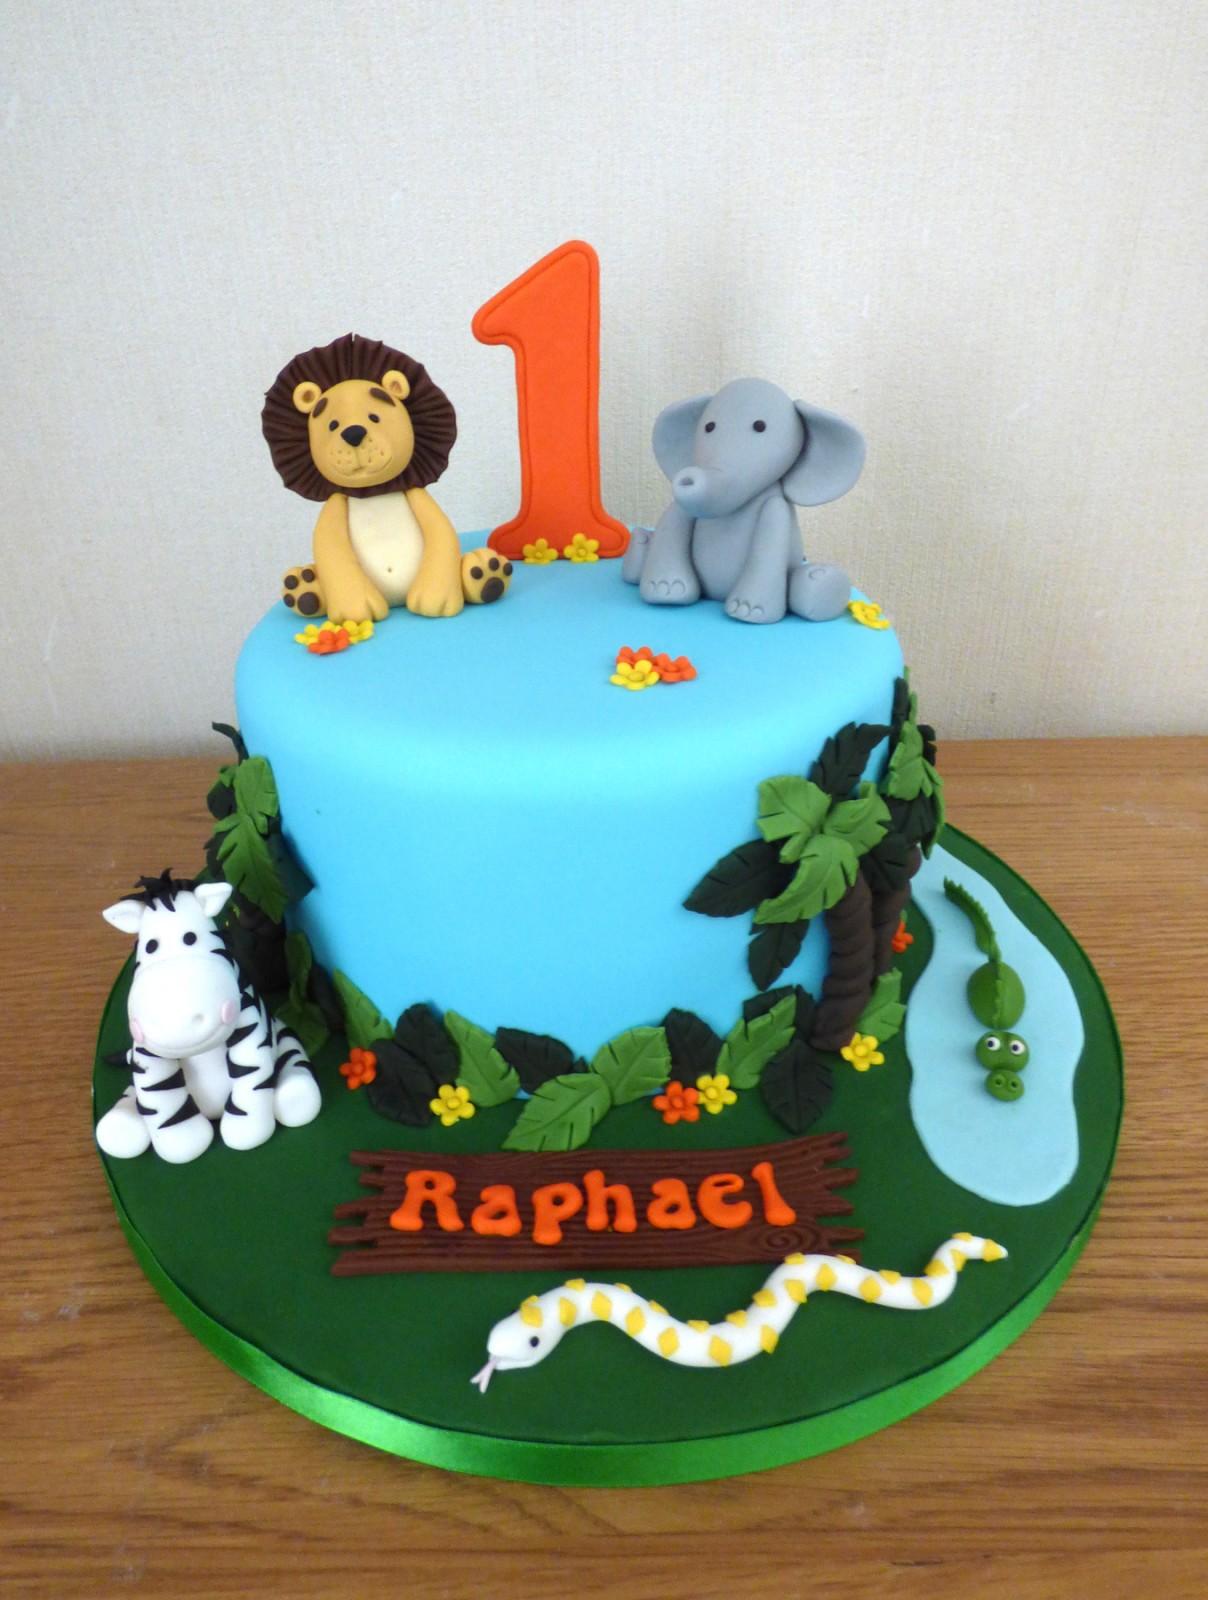 Swell Jungle Animal Themed 1St Birthday Cake Susies Cakes Funny Birthday Cards Online Inifodamsfinfo